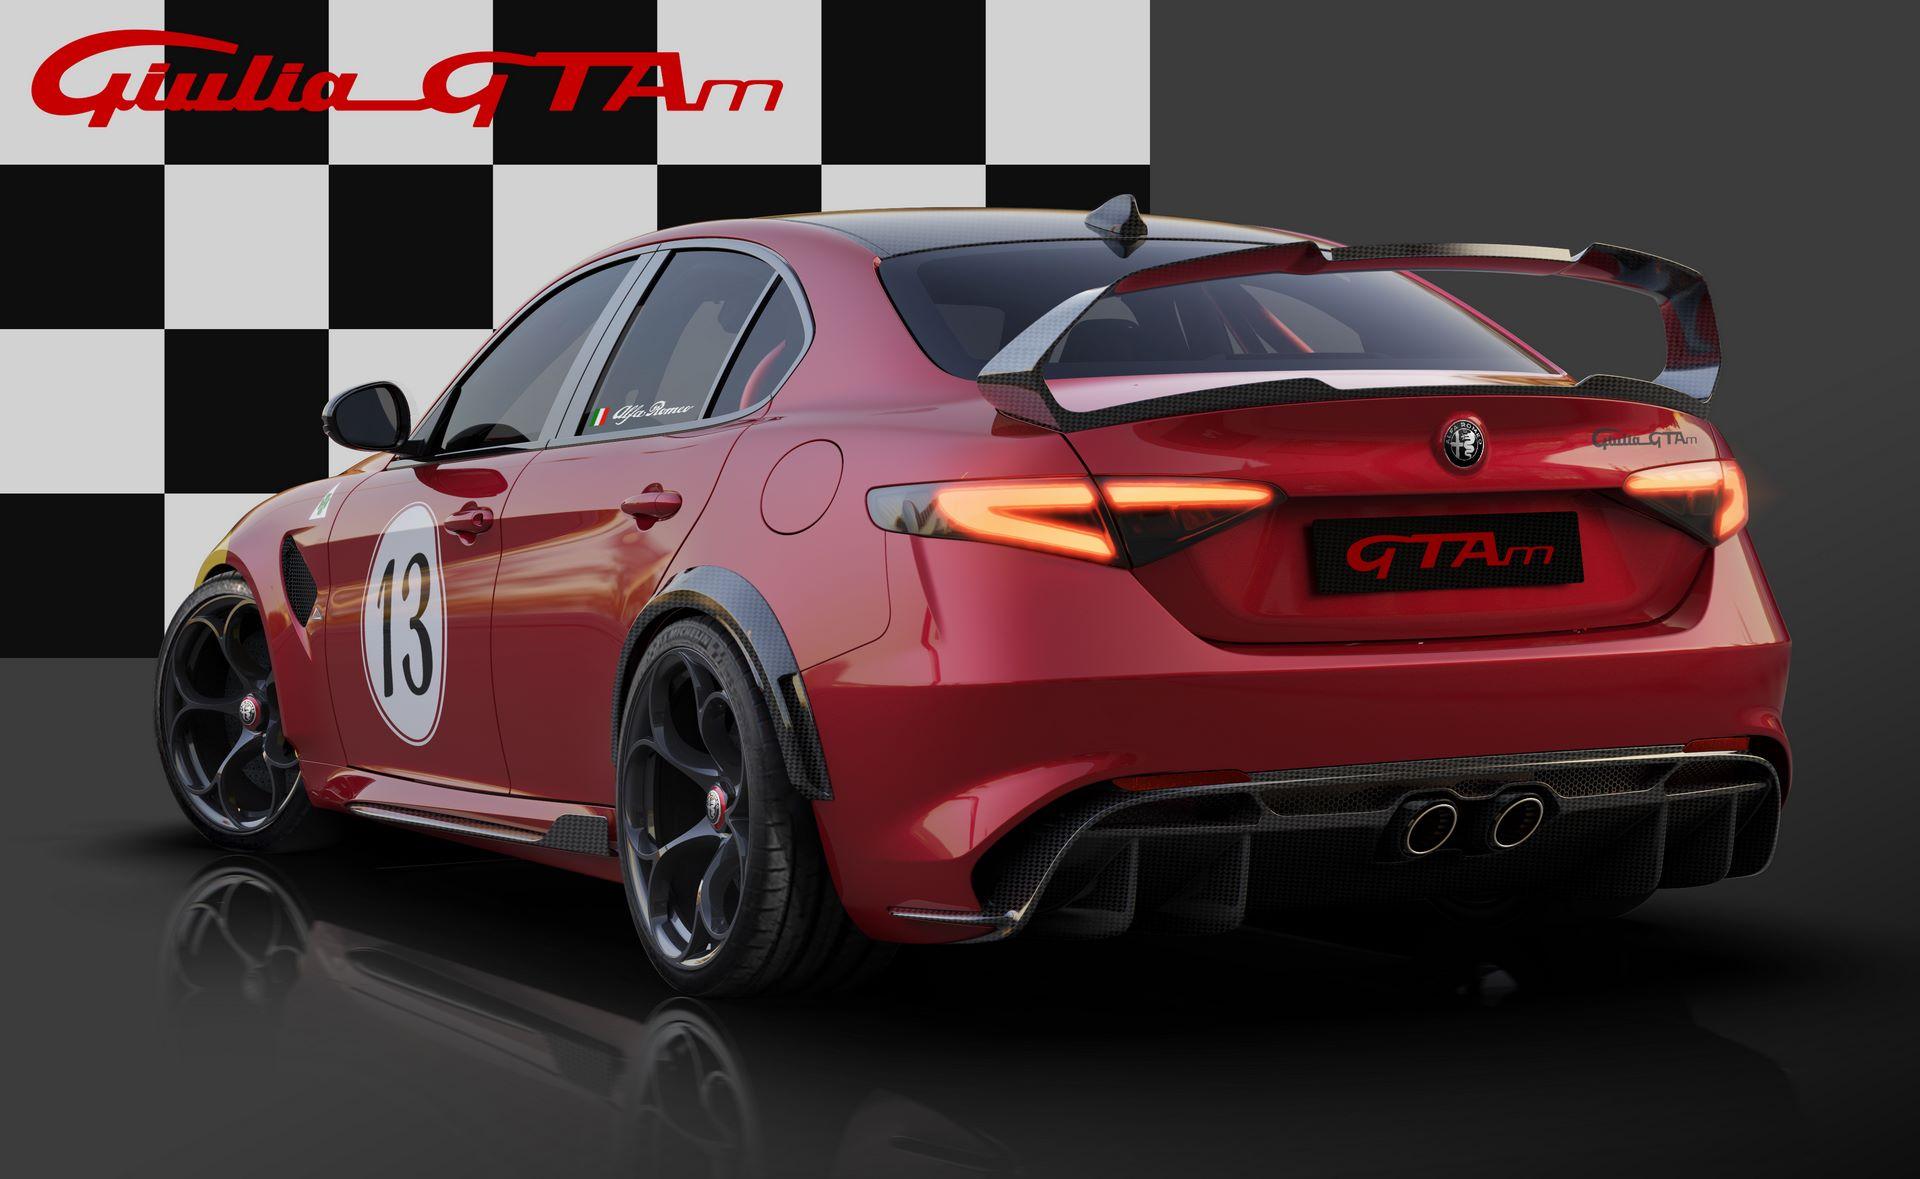 14_Alfa-Romeo-Giulia-GTA-dedicated-Livery